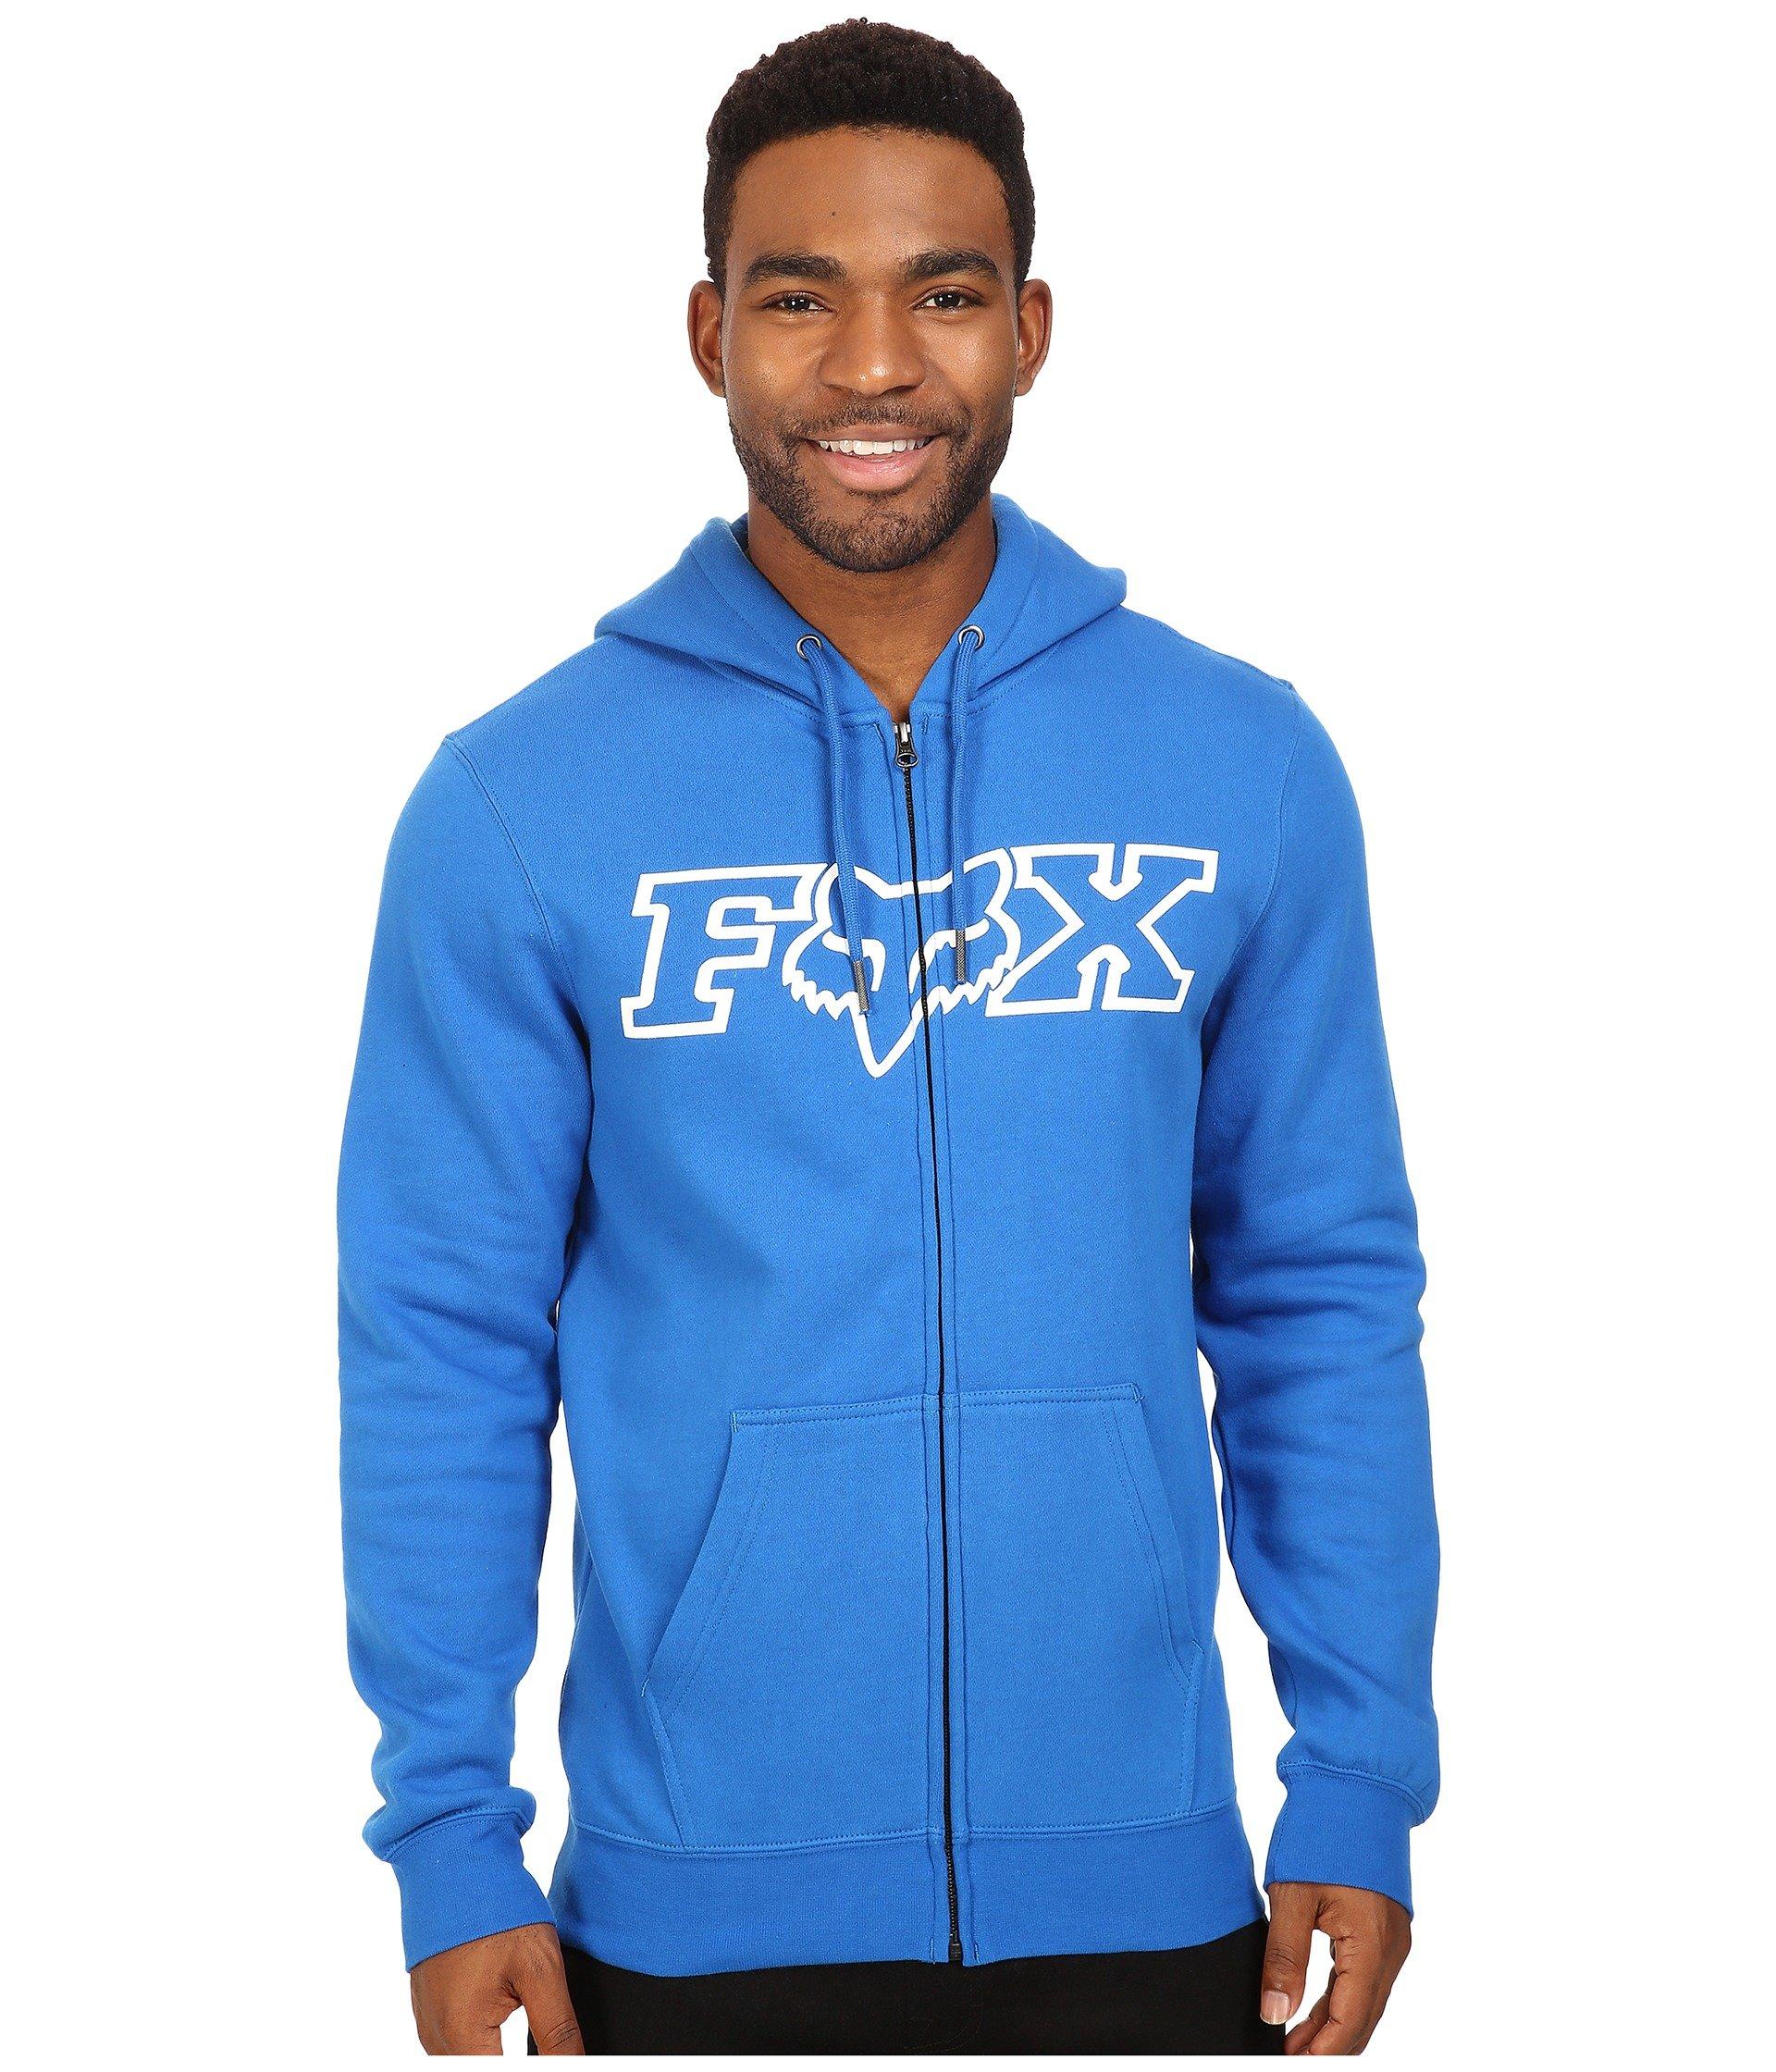 Buzo o Chaqueta Deportiva para Hombre Fox Legacy Fox Head Zip Fleece  + Fox en VeoyCompro.net